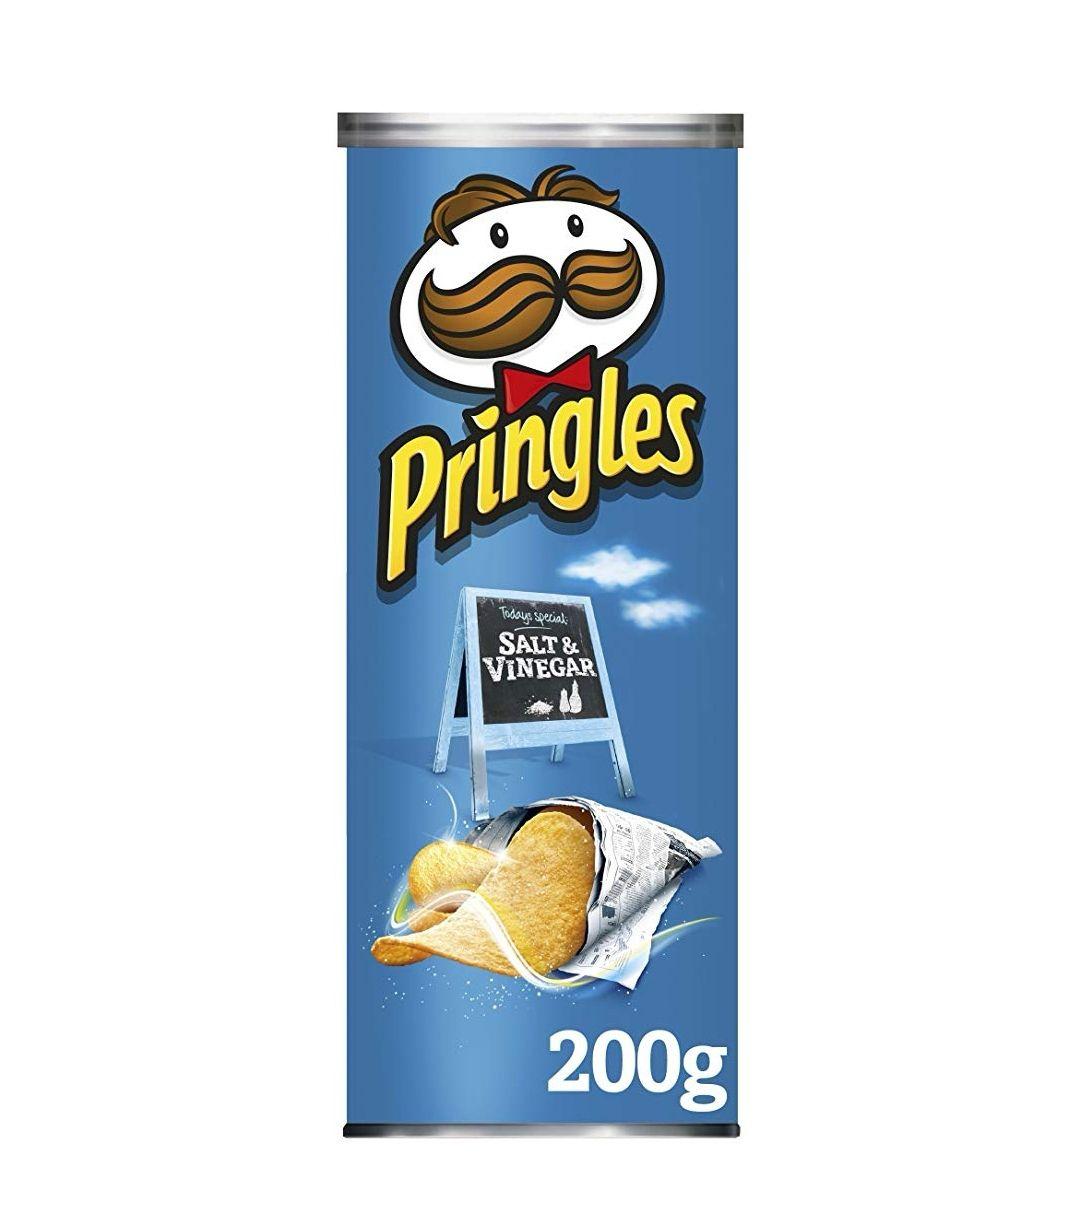 Pringles Salt and Vinegar Potato Crisps, 200g 90p w/voucher on page @ Amazon Pantry (First box £2.99 Del)